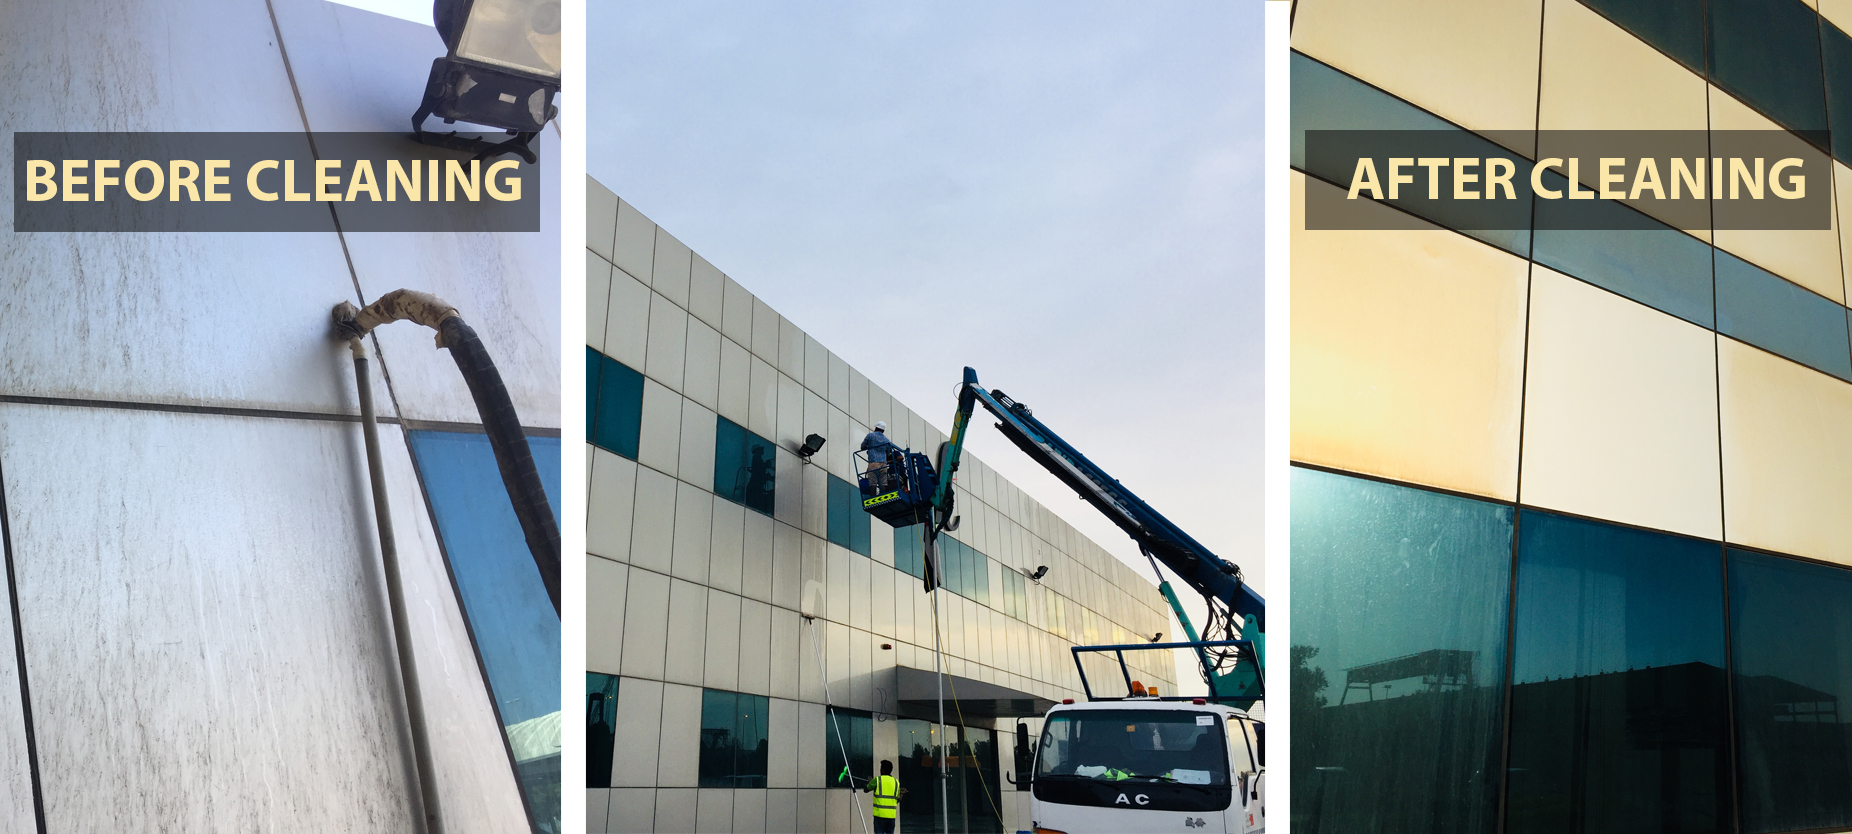 Aluminium Cladding Cleaning | Dubai and Abu Dhabi